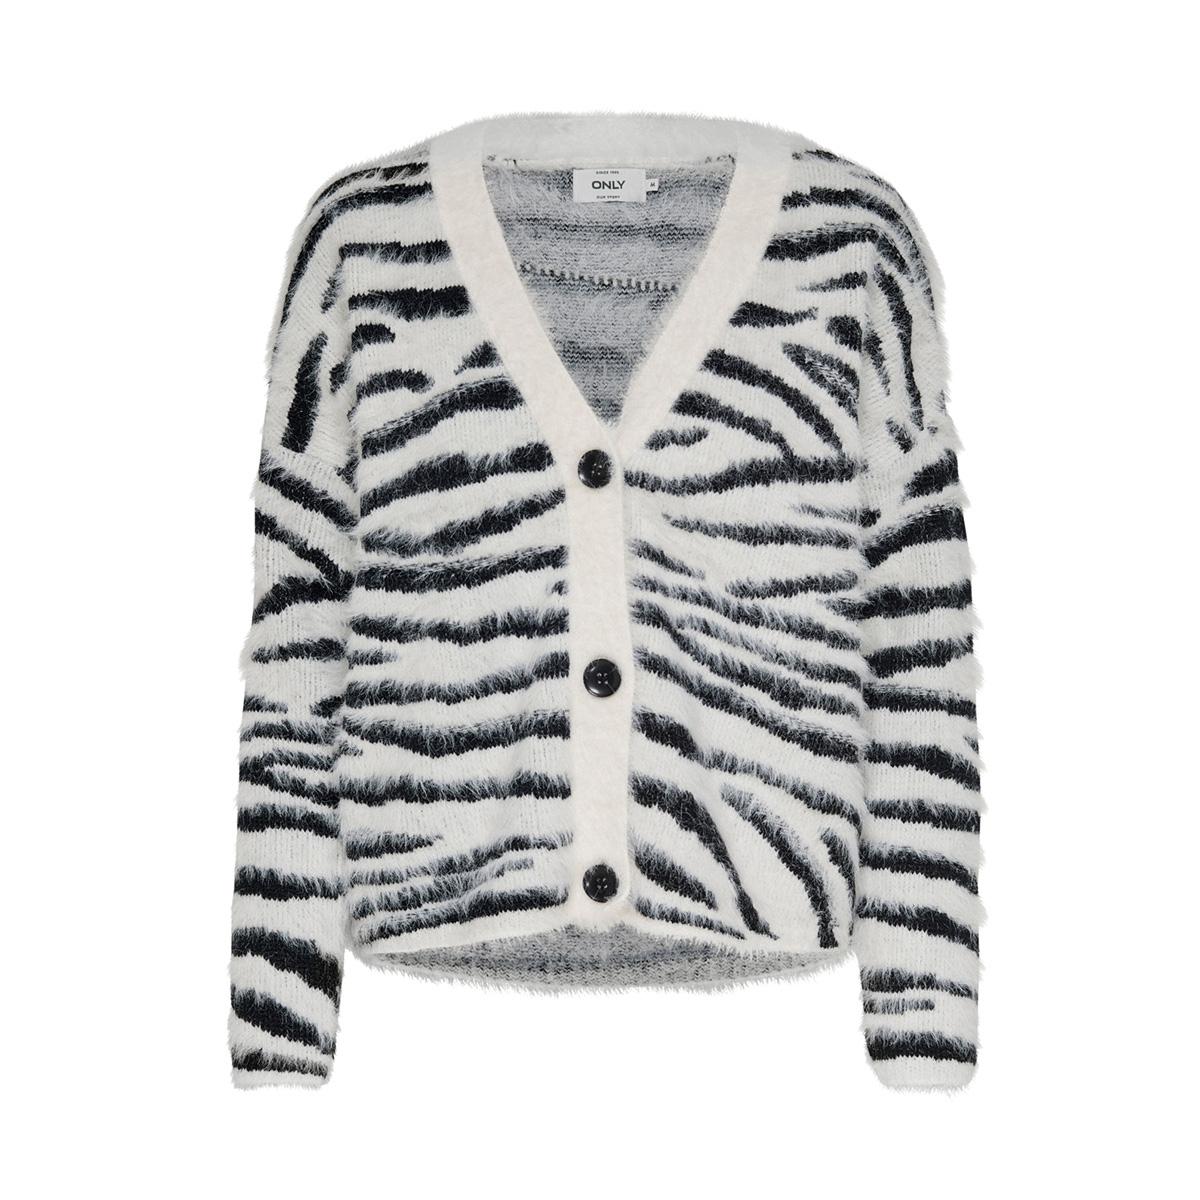 onlroar l/s cardigan knt 15192169 only vest cloud dancer/w. black zebra